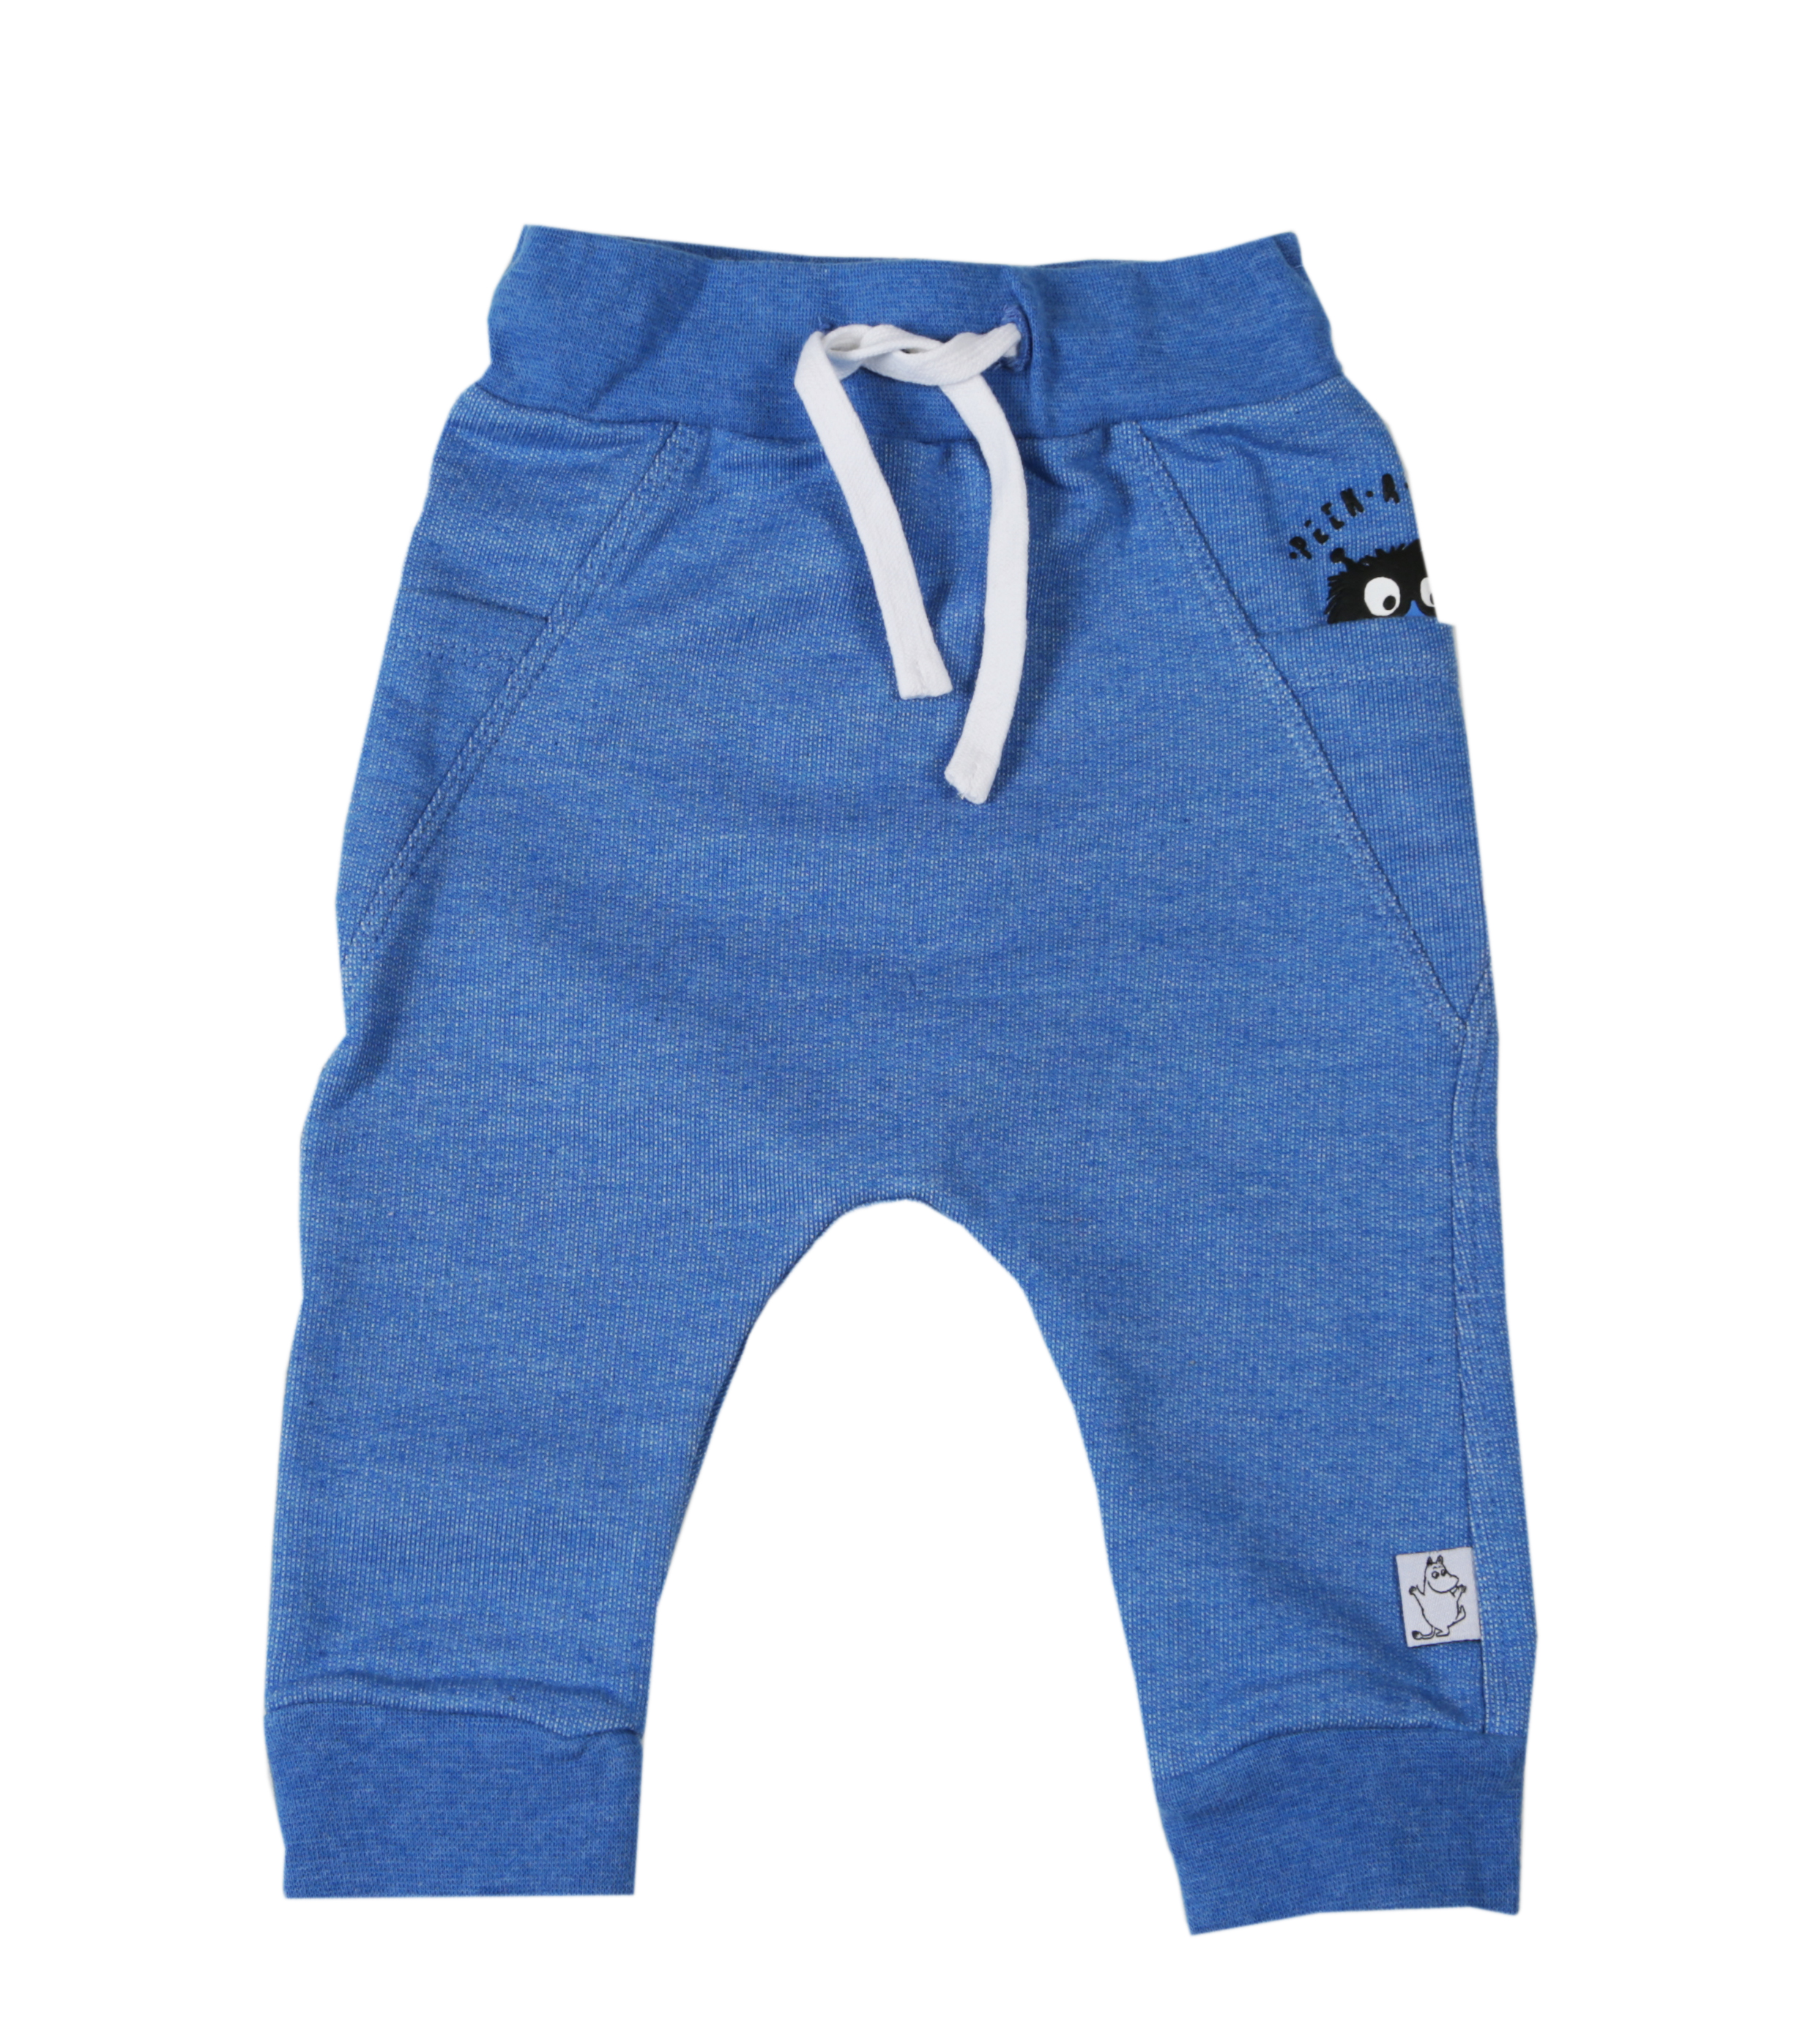 Martinex Kukkuu -pants blue